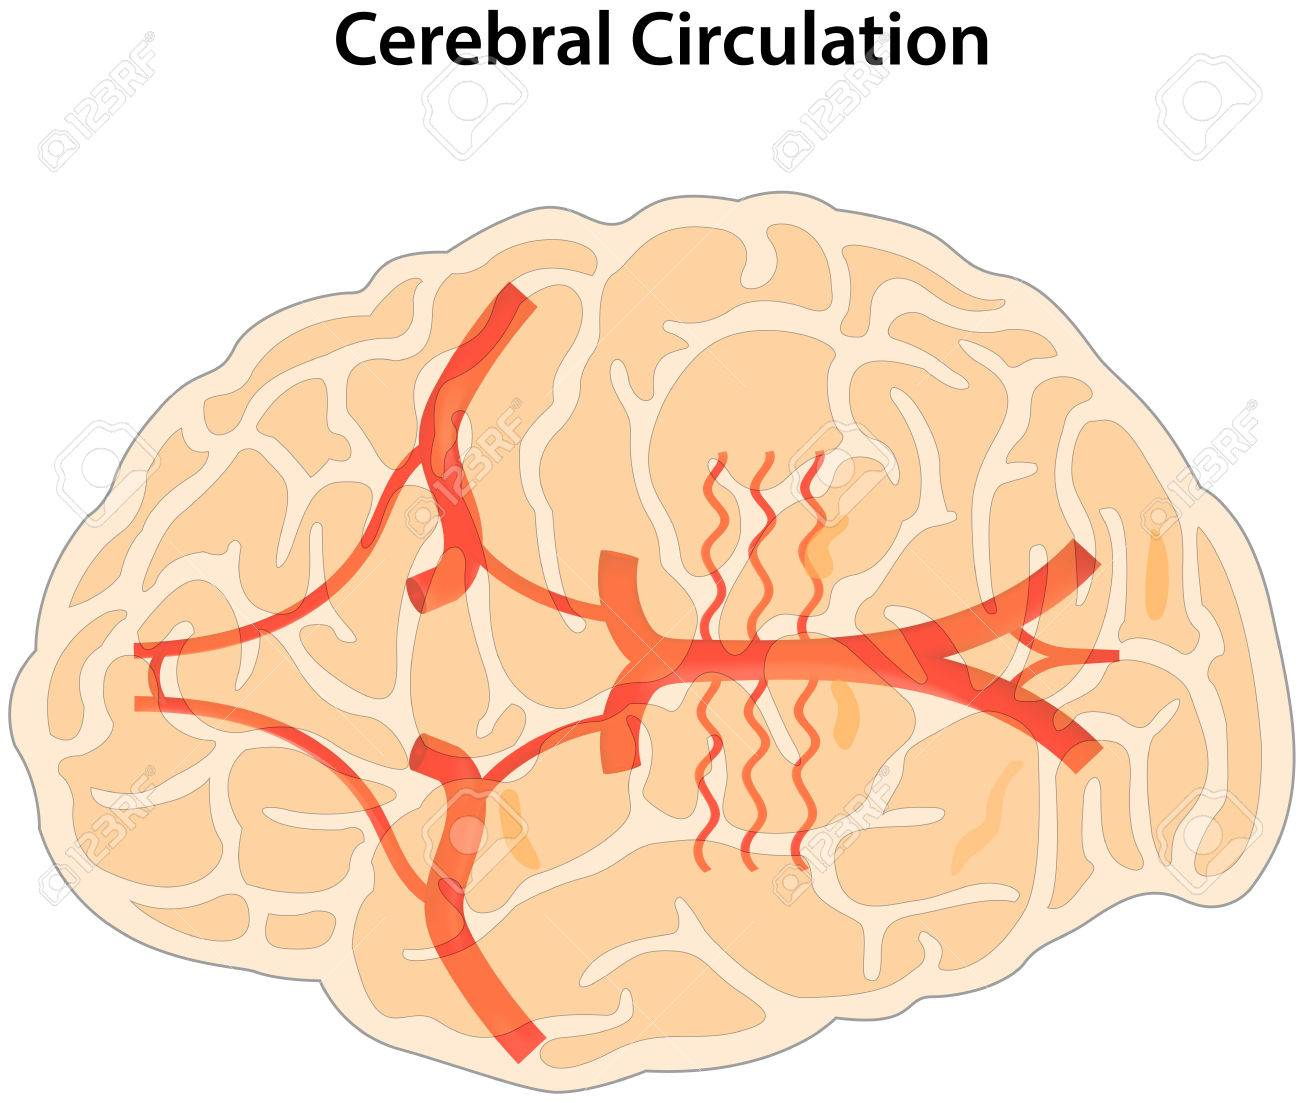 Cerebral Circulation Royalty Free Cliparts, Vectors, And Stock ...